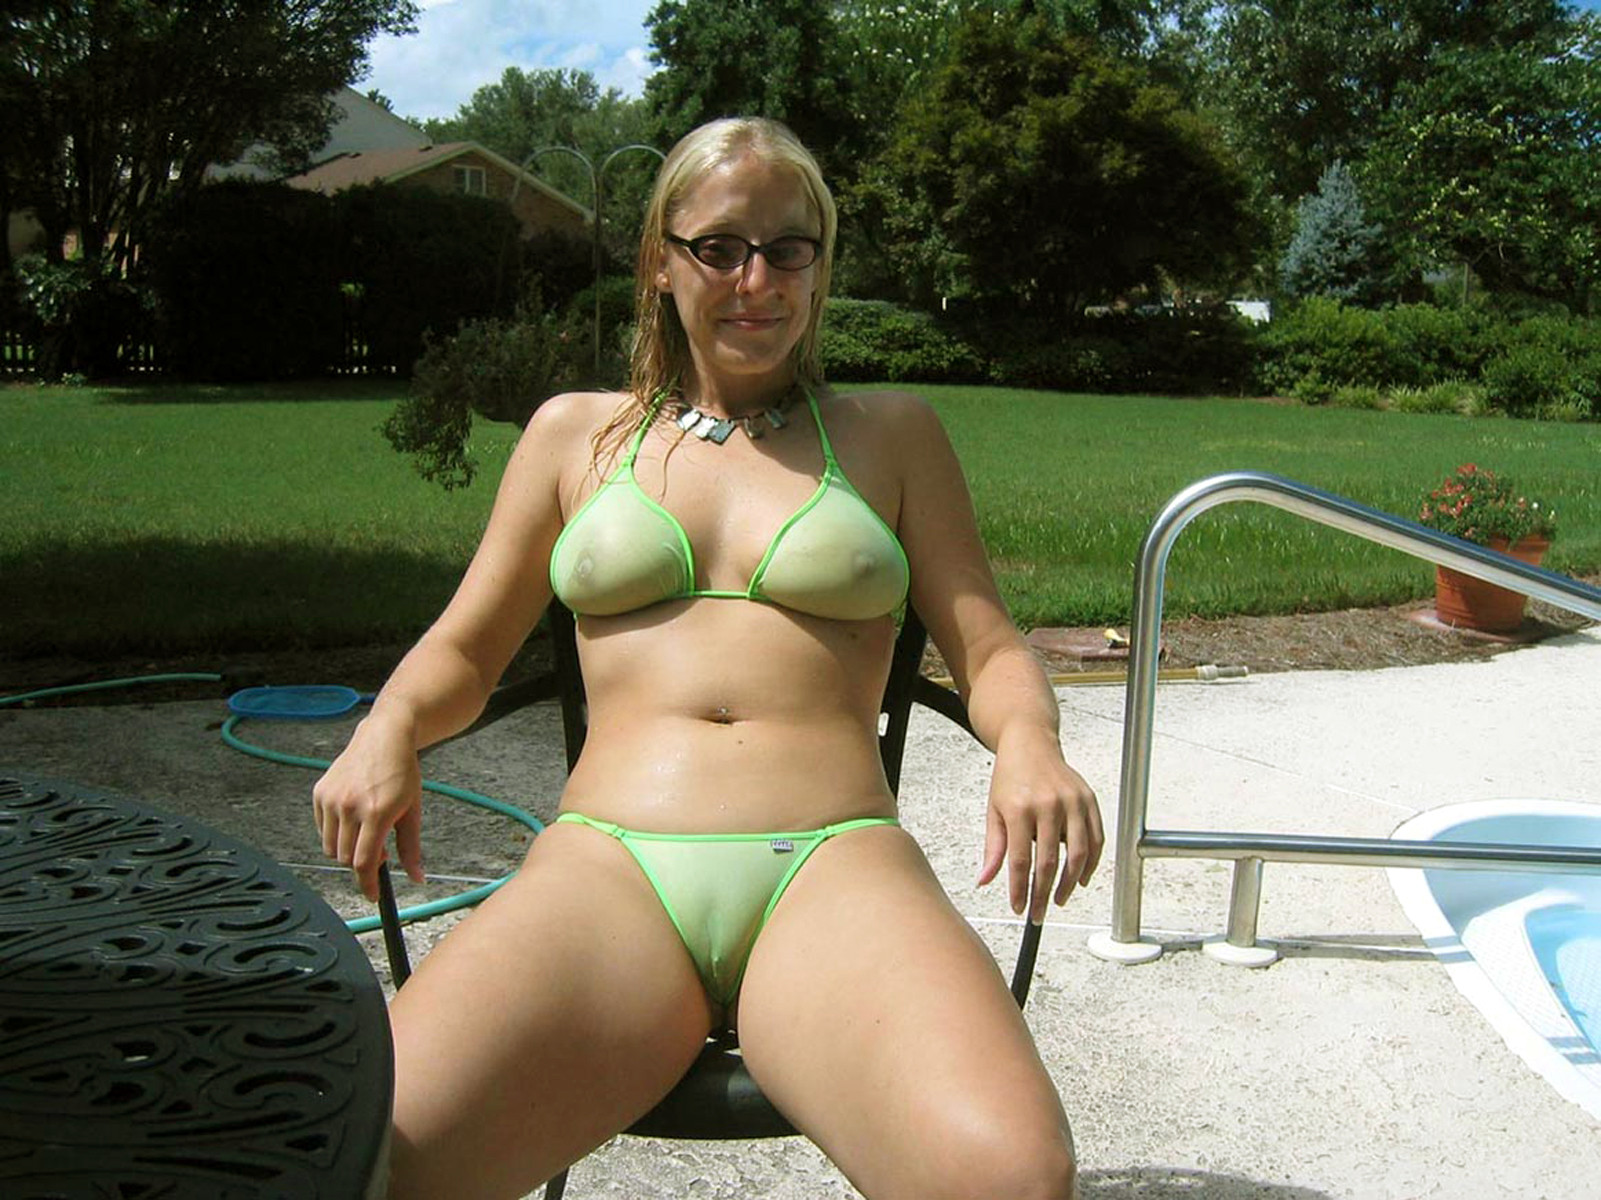 Images of Amateur Sheer Bikini - Amateur Adult Gallery